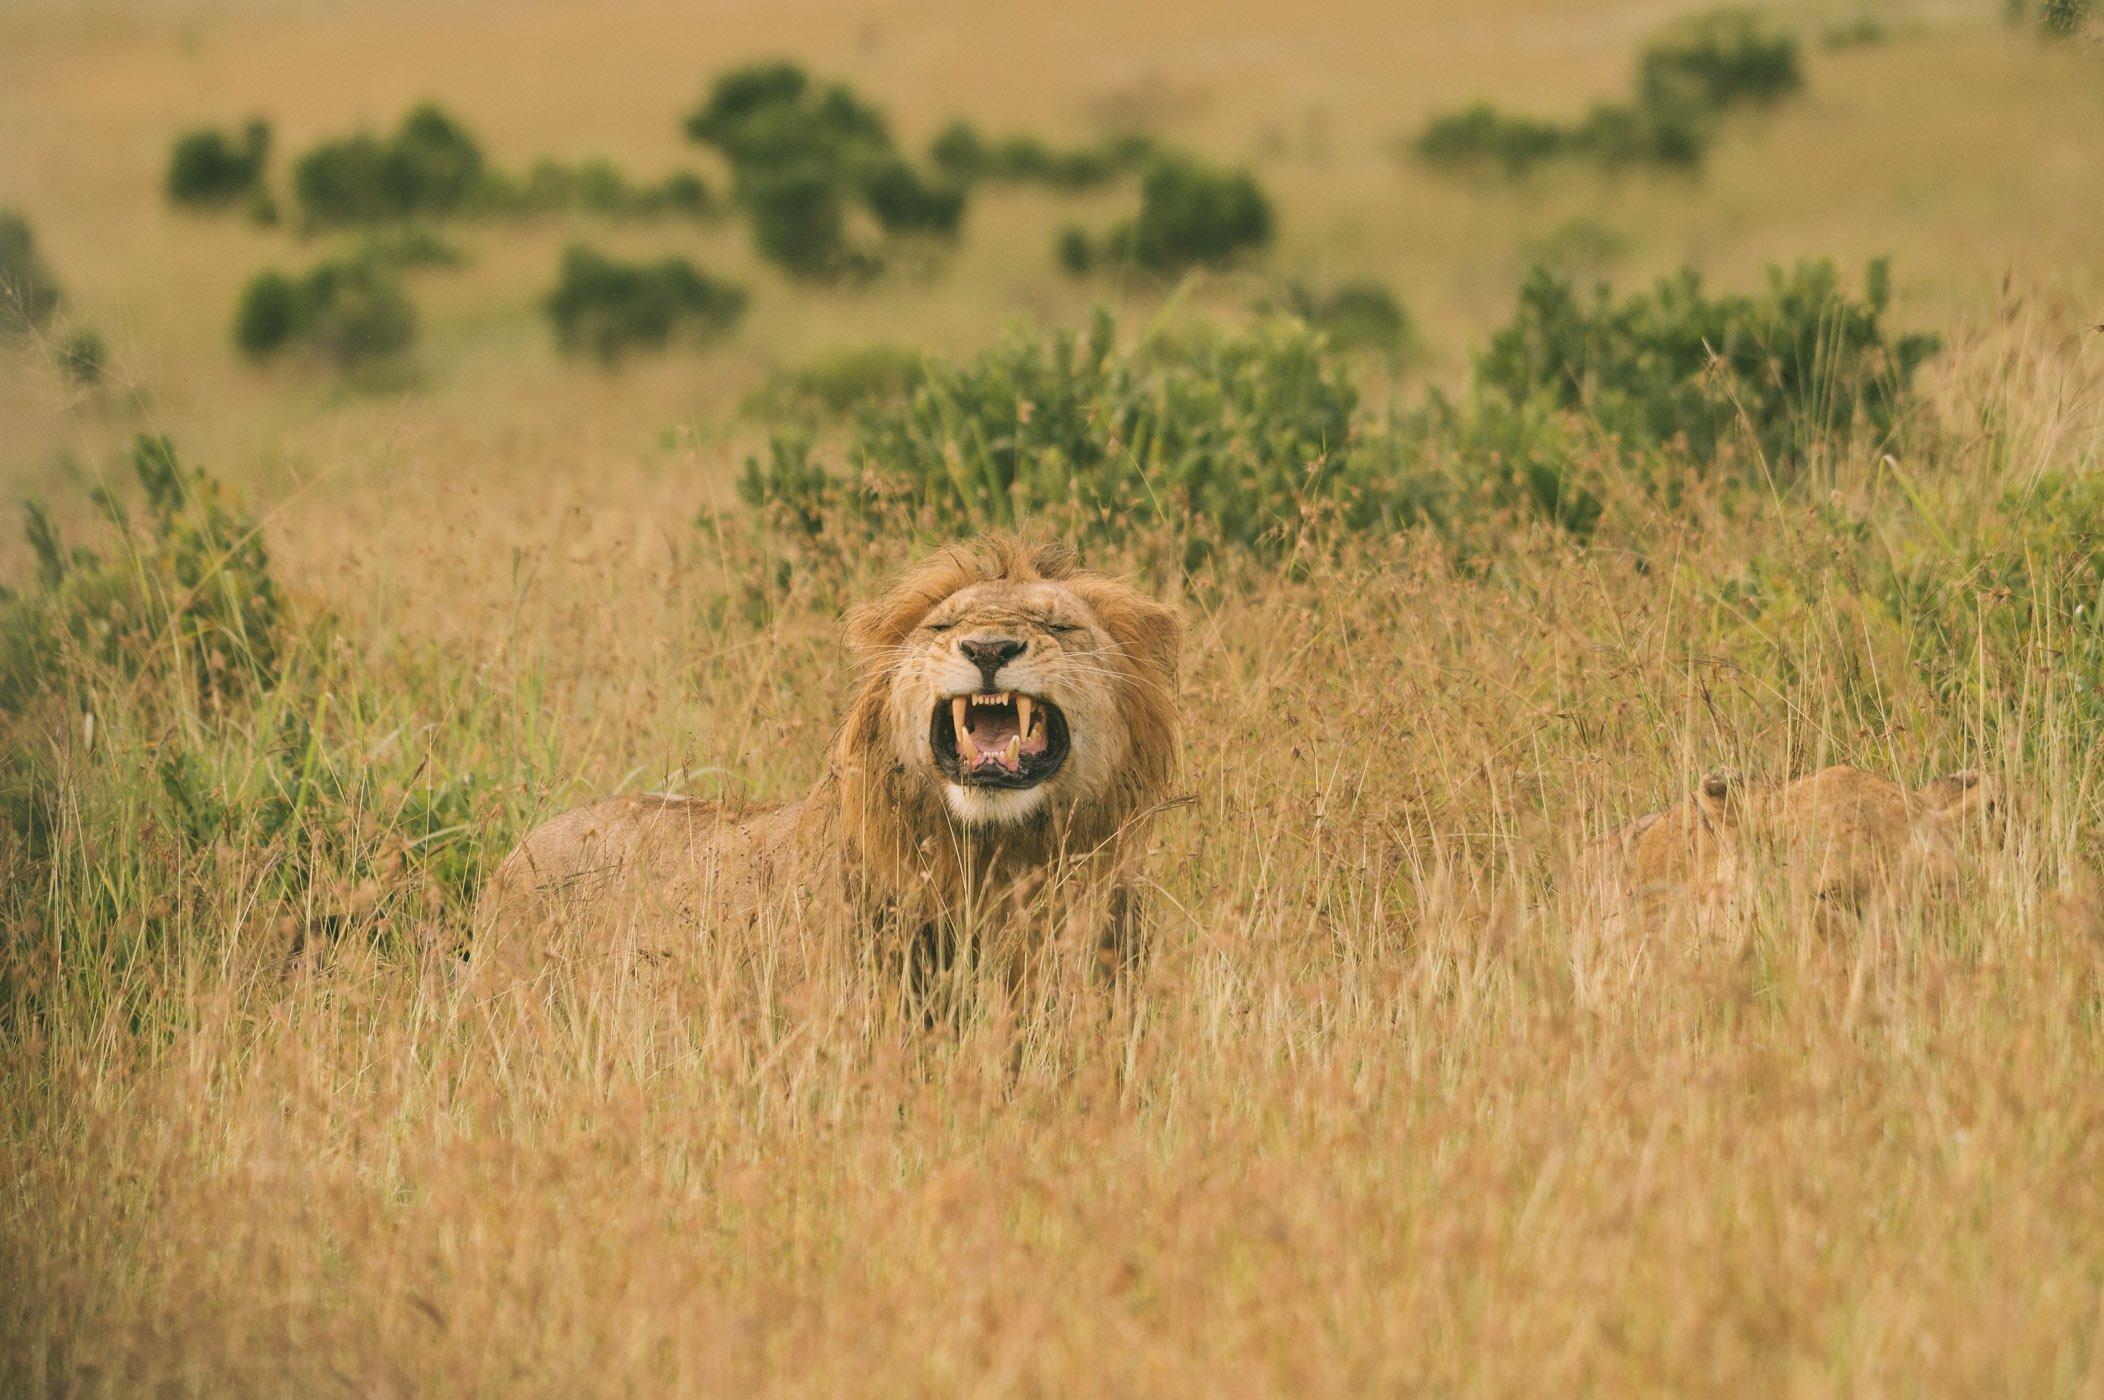 Mating lions in the Maasai Mara in Kenya